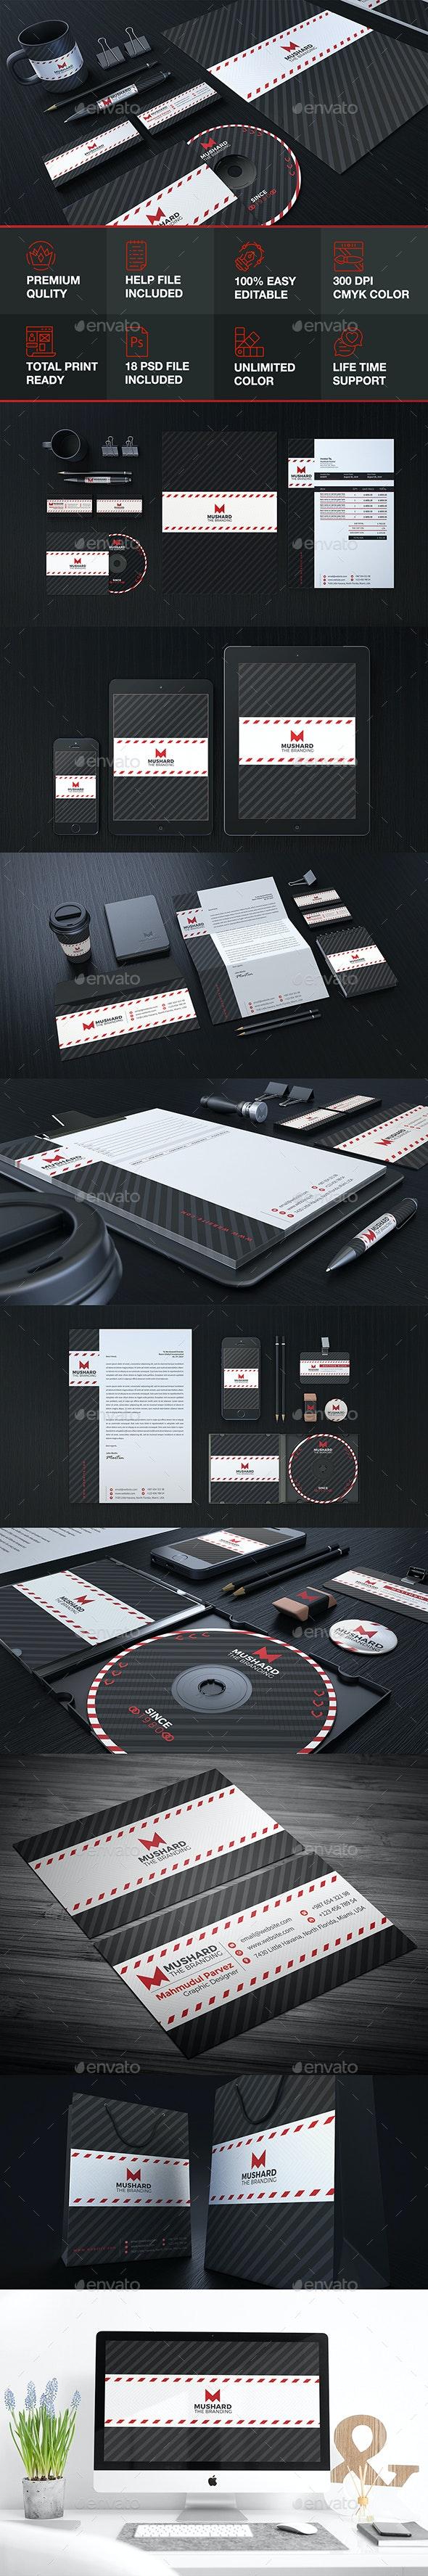 Mushard Branding Stationary Identity - Stationery Print Templates